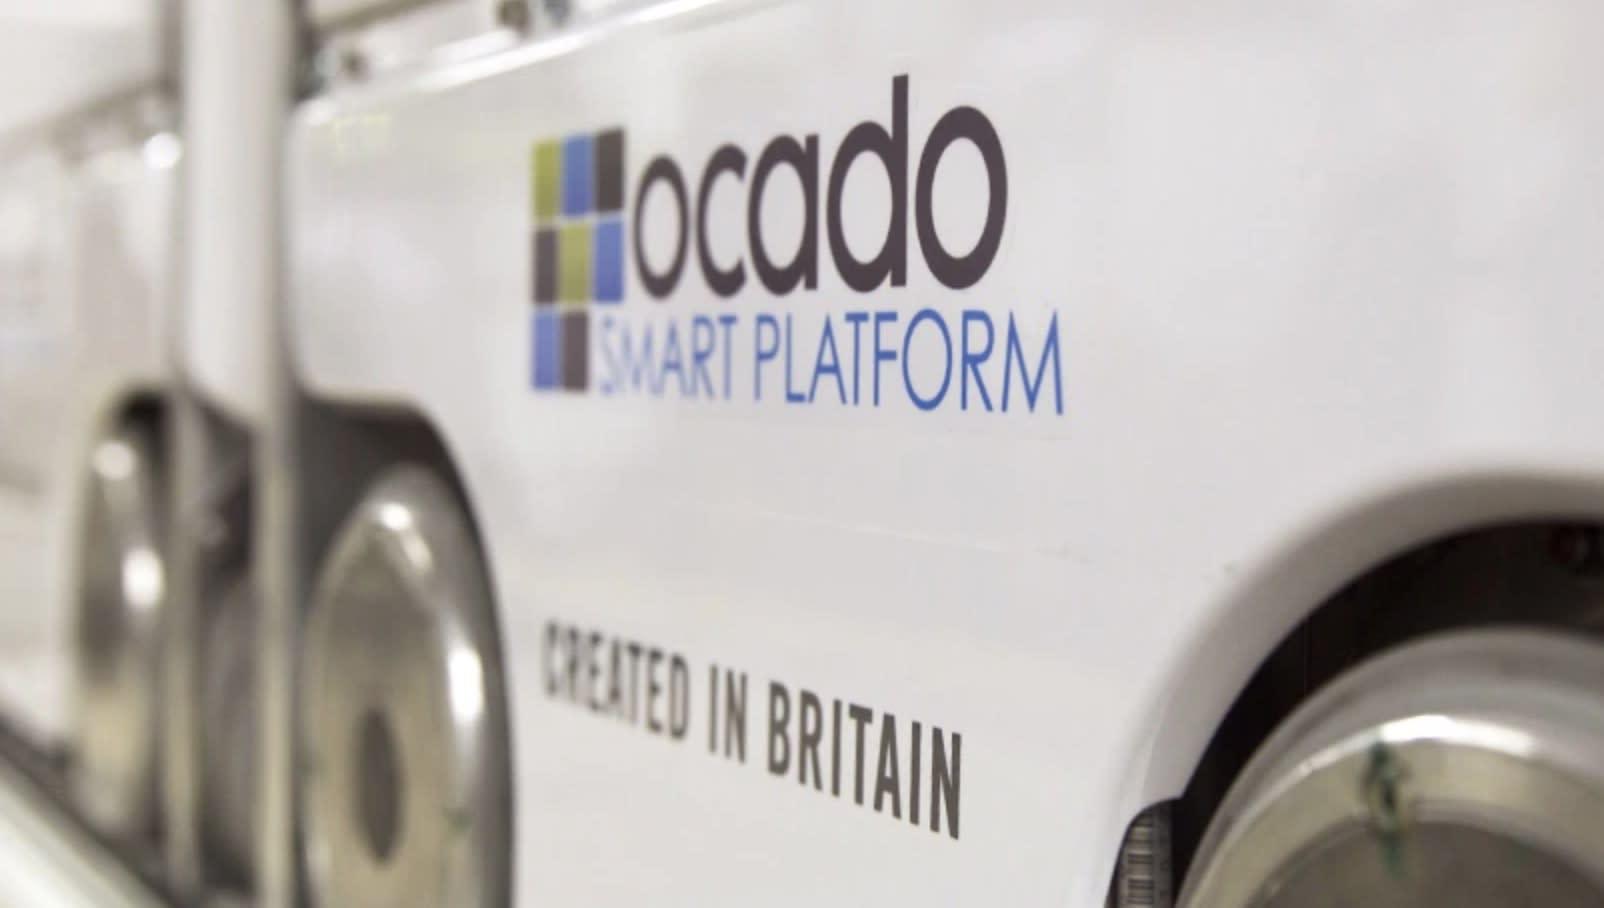 Oxbotica raises $13.8M from Ocado to build autonomous vehicle tech for the online grocer's logistics network